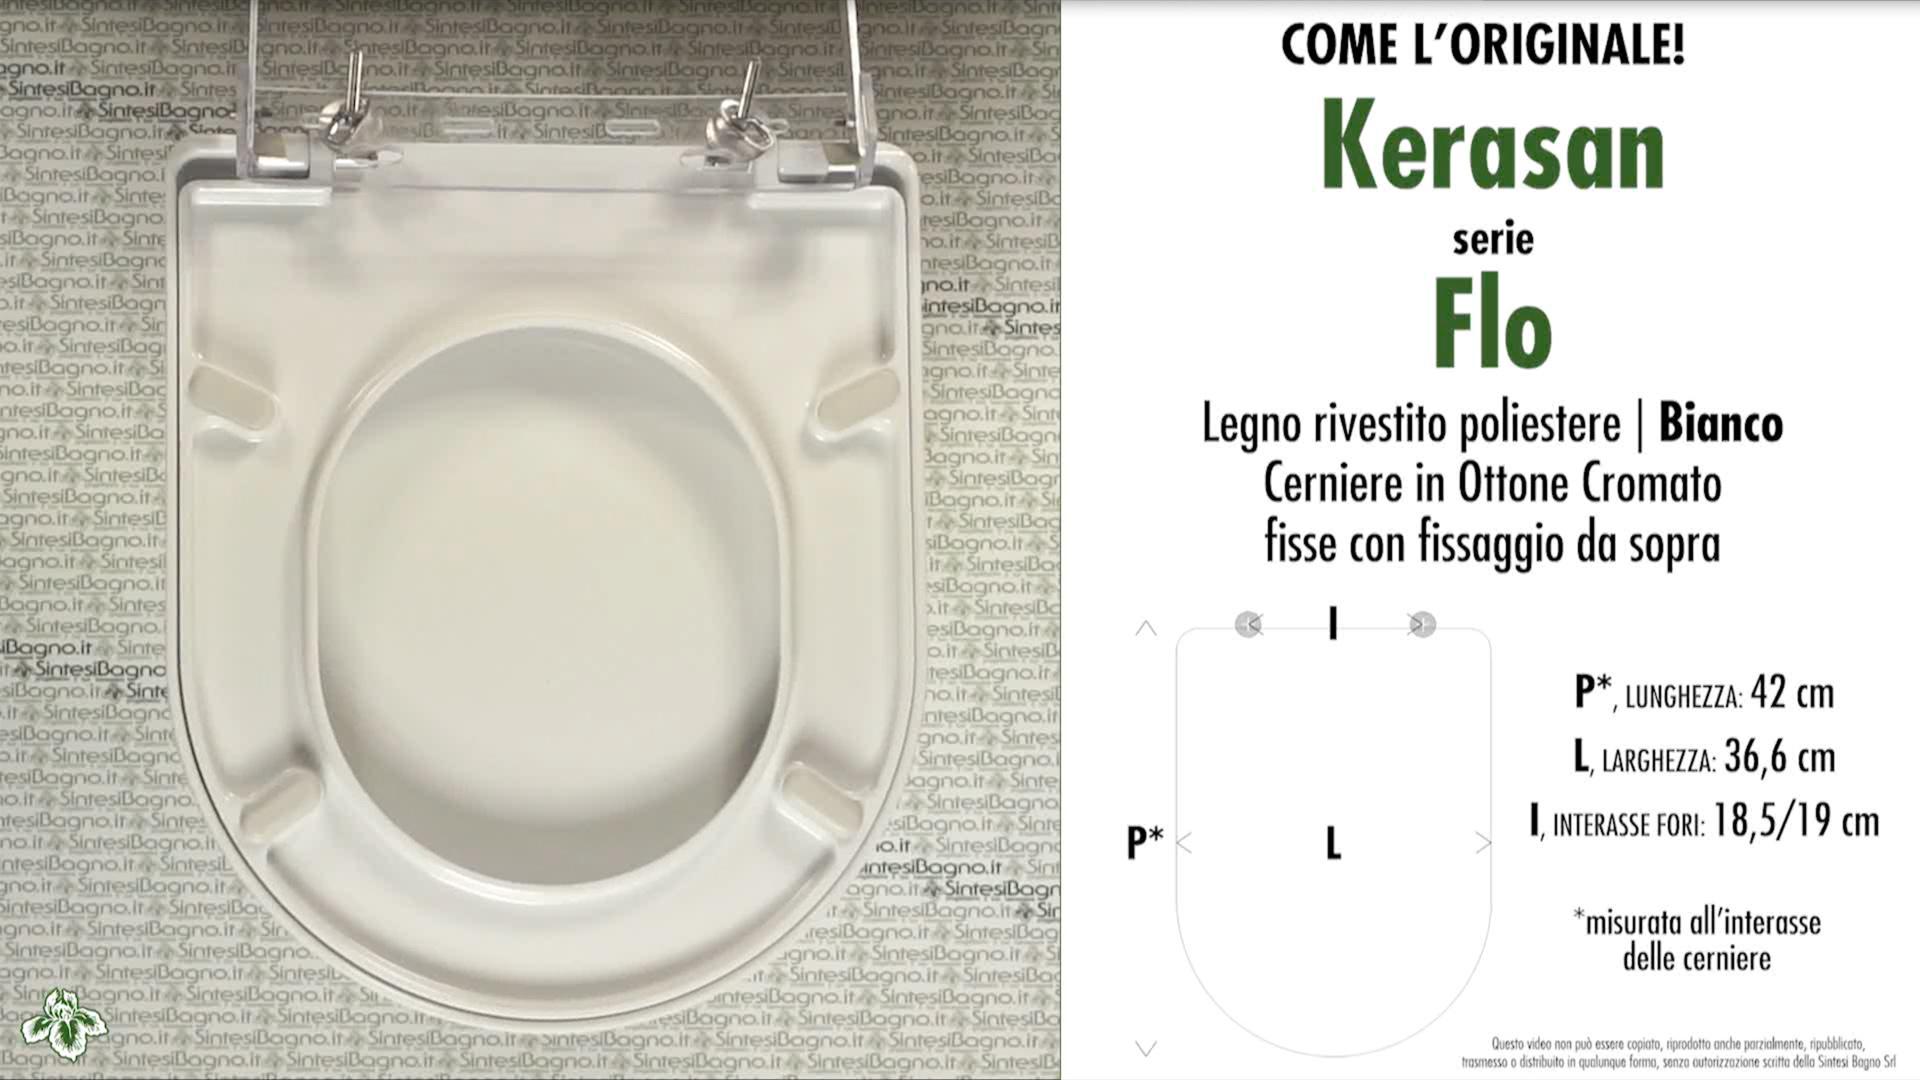 Schede tecniche Kerasan Flo